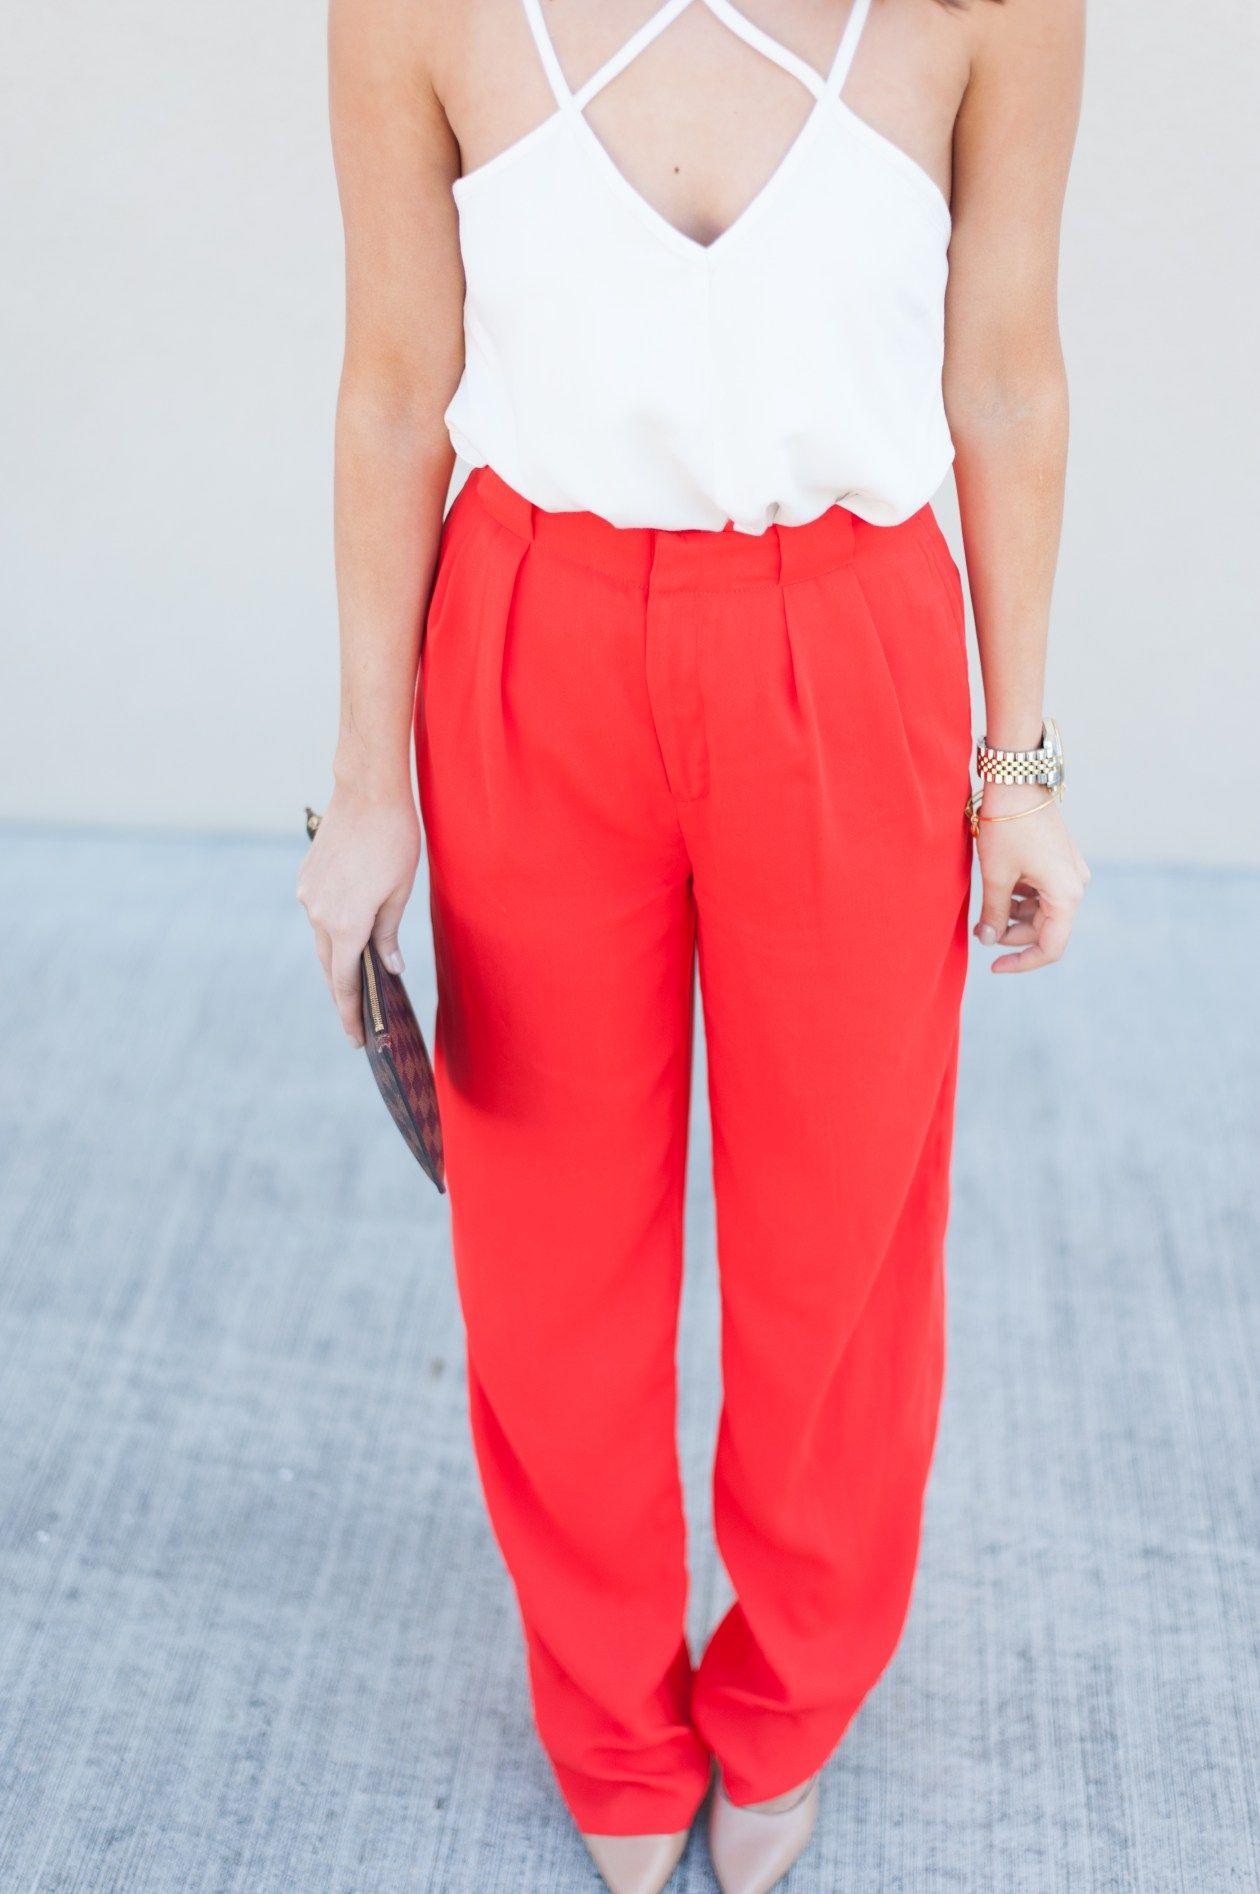 Dress Up Buttercup | Houston Fashion Blog - Dede Raad | Red Wide Leg Criss Cross Tank